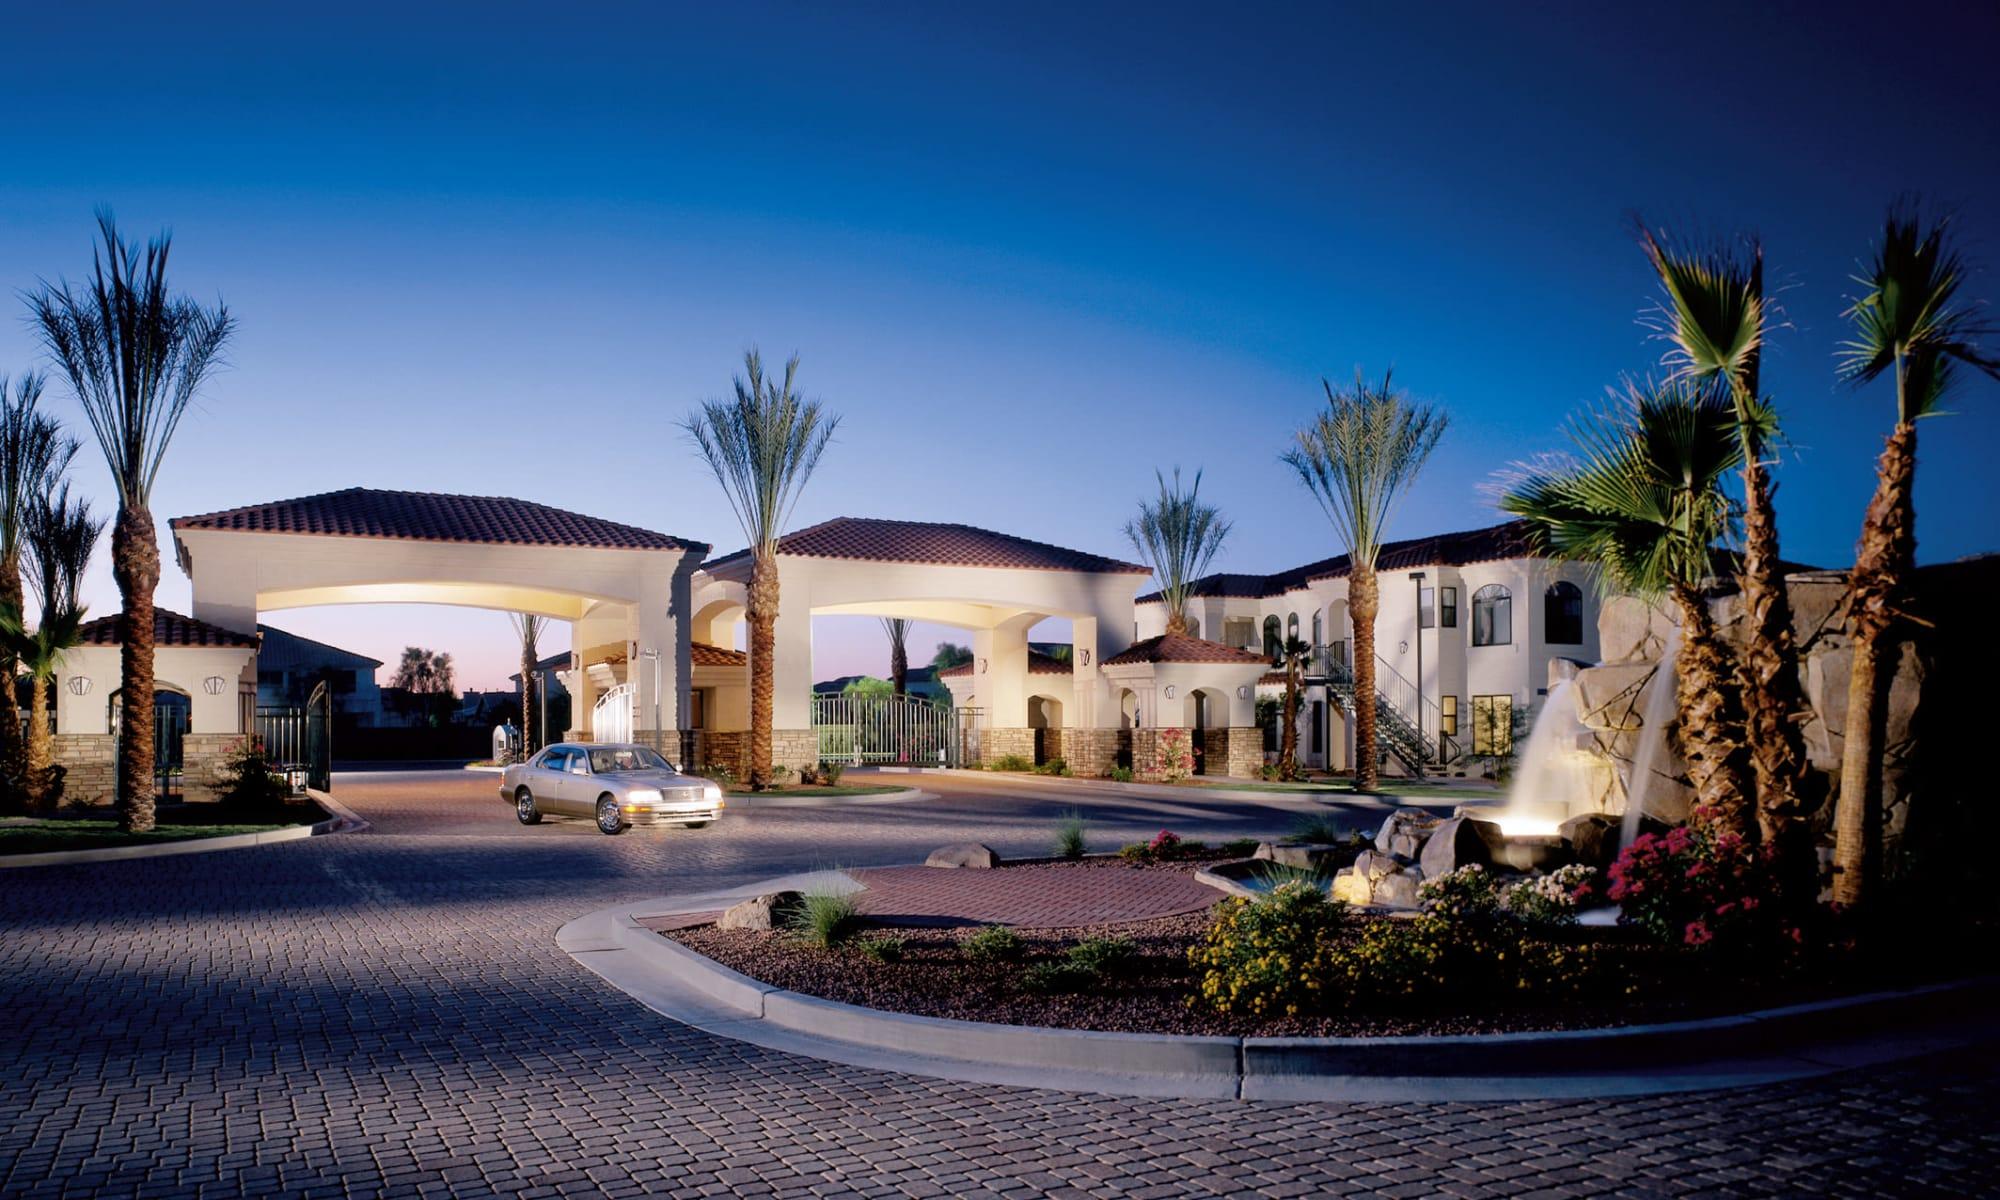 Apartments in Chandler, Arizona, at San Cervantes